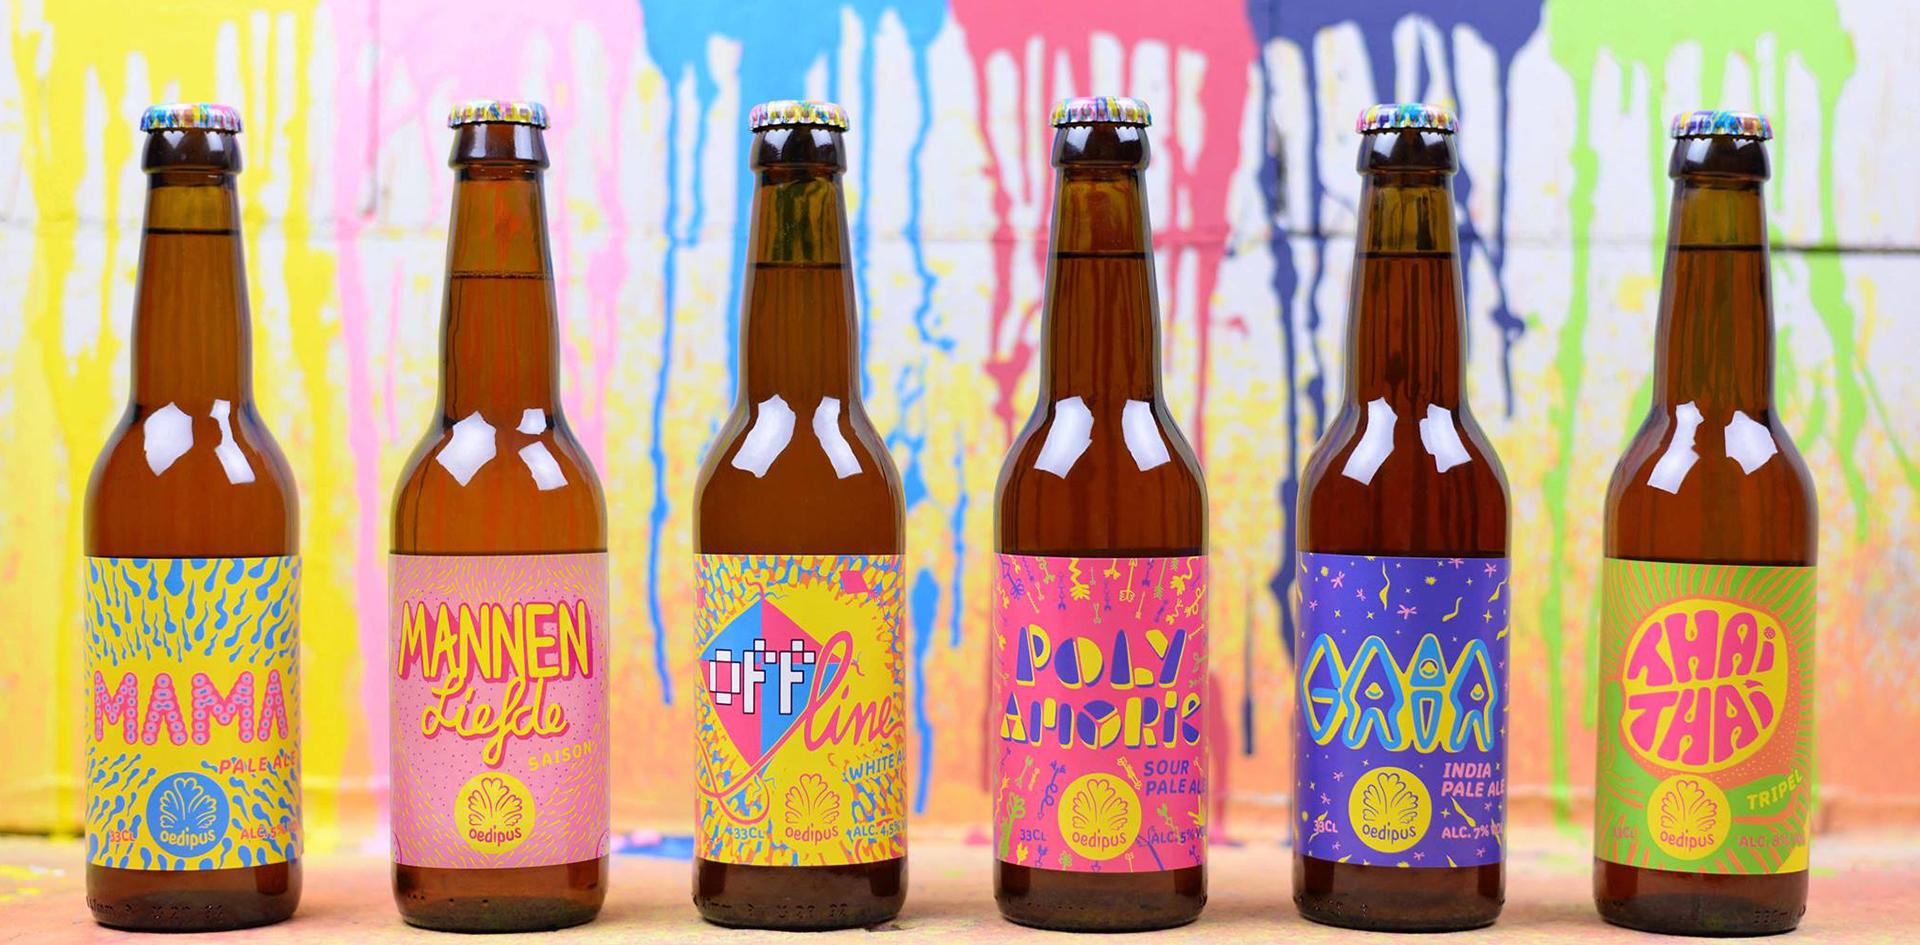 nectar-utrecht-pils-bier-brouwerij-nederland-streekbier-amsterdam-oedipus-assortiment